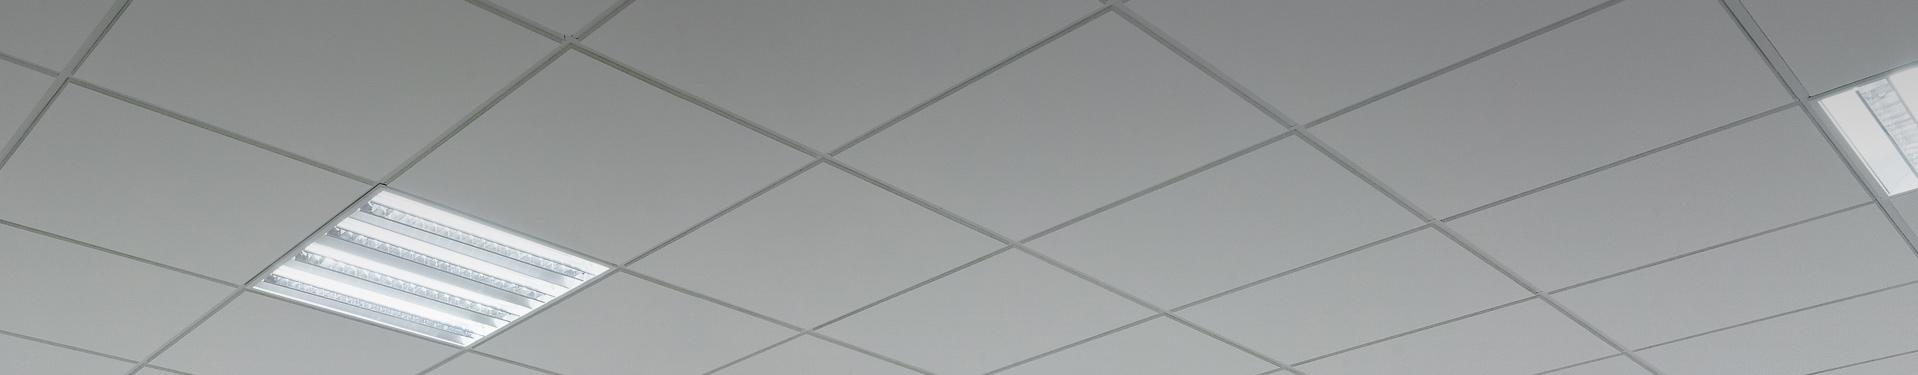 Falso techo registrable affordable falsos techos de - Falso techo decorativo ...